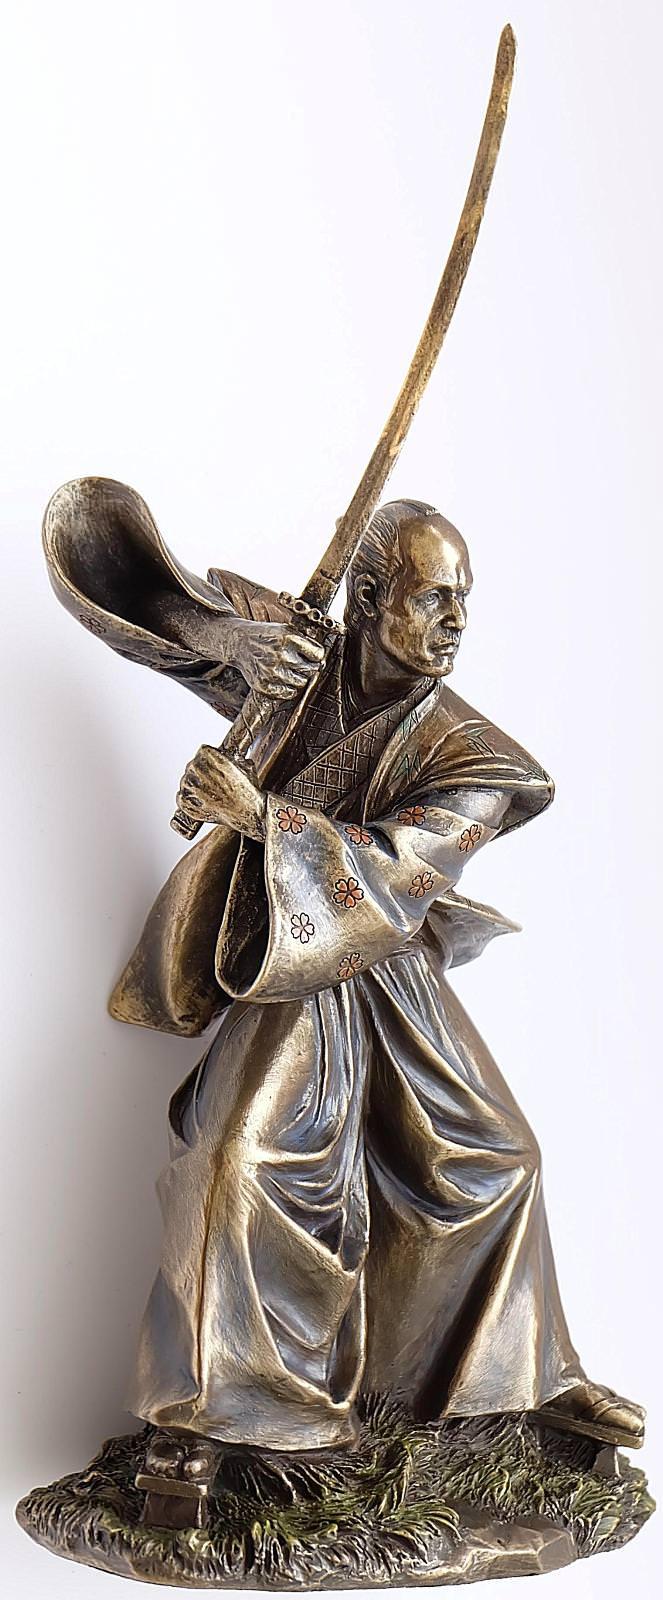 Samuraikrieger mit Schwert in Angriffsstellung Samurai Krieger Figur